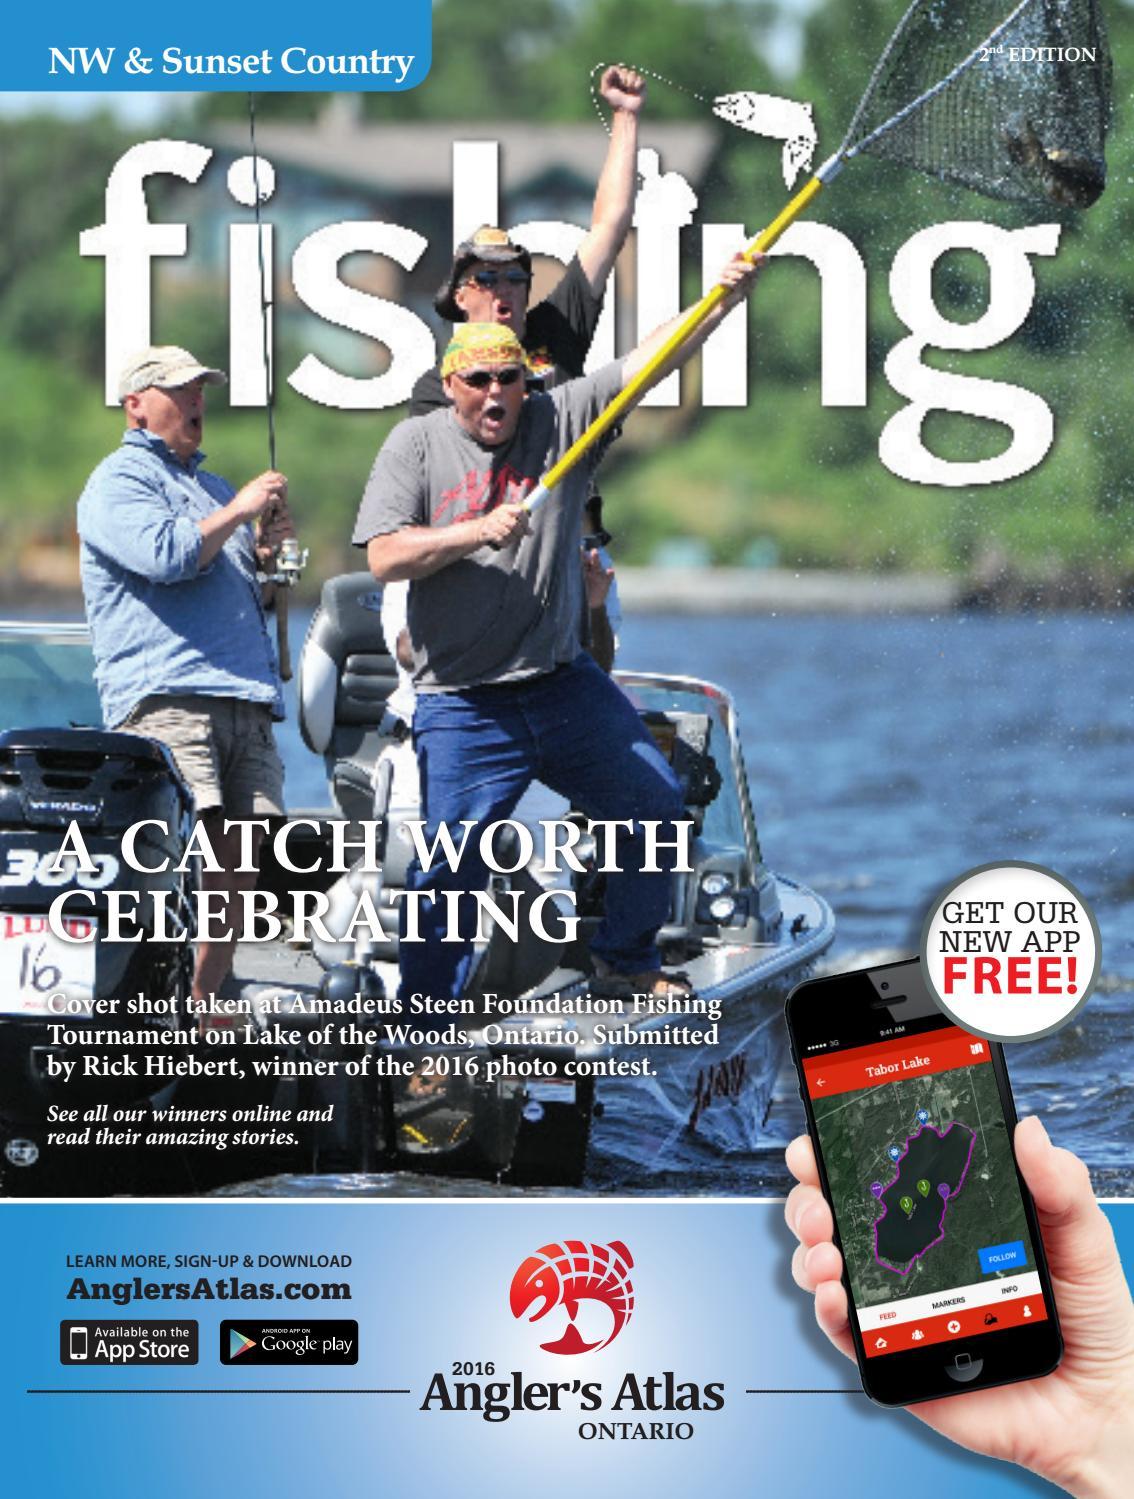 Angler's Atlas Northwest Ontario Fishing Guide by Glacier Specialty